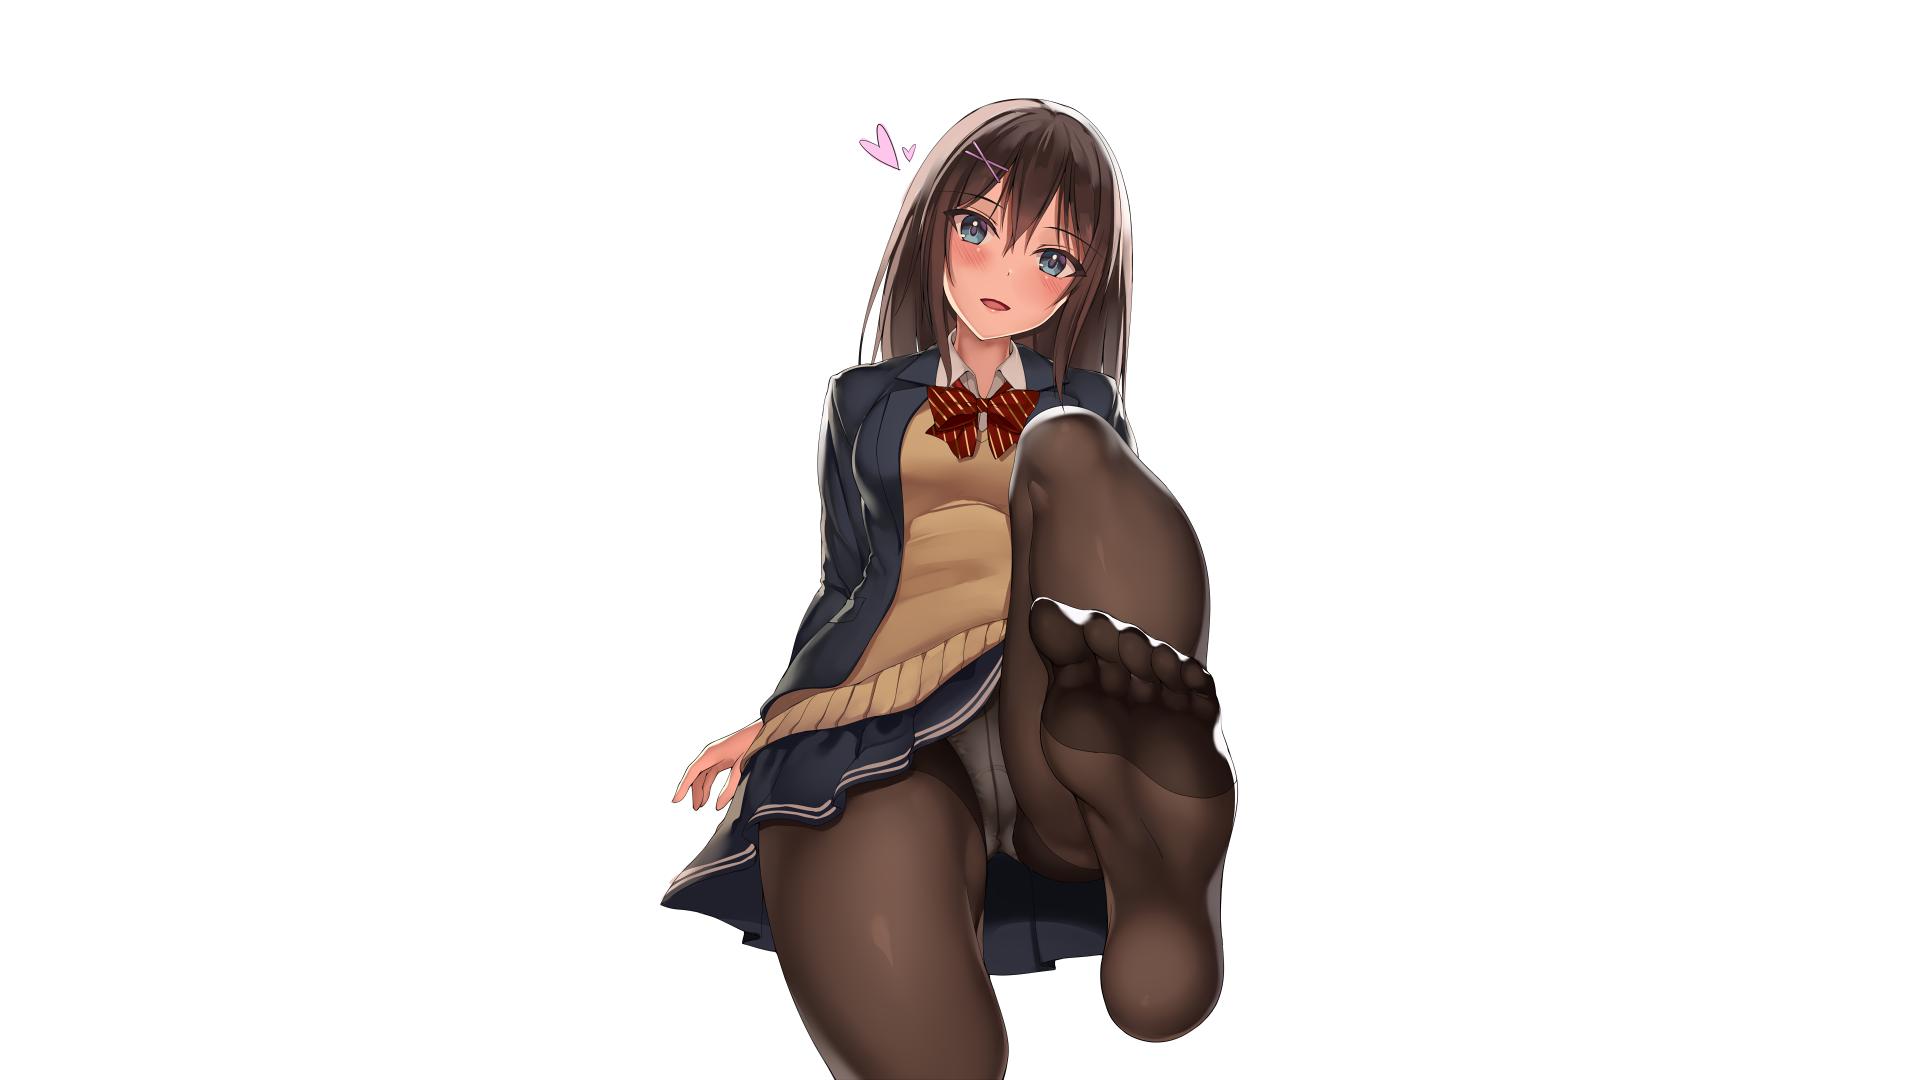 Anime Schoolgirl Upskirt wallpaper : anime girls, original characters, women